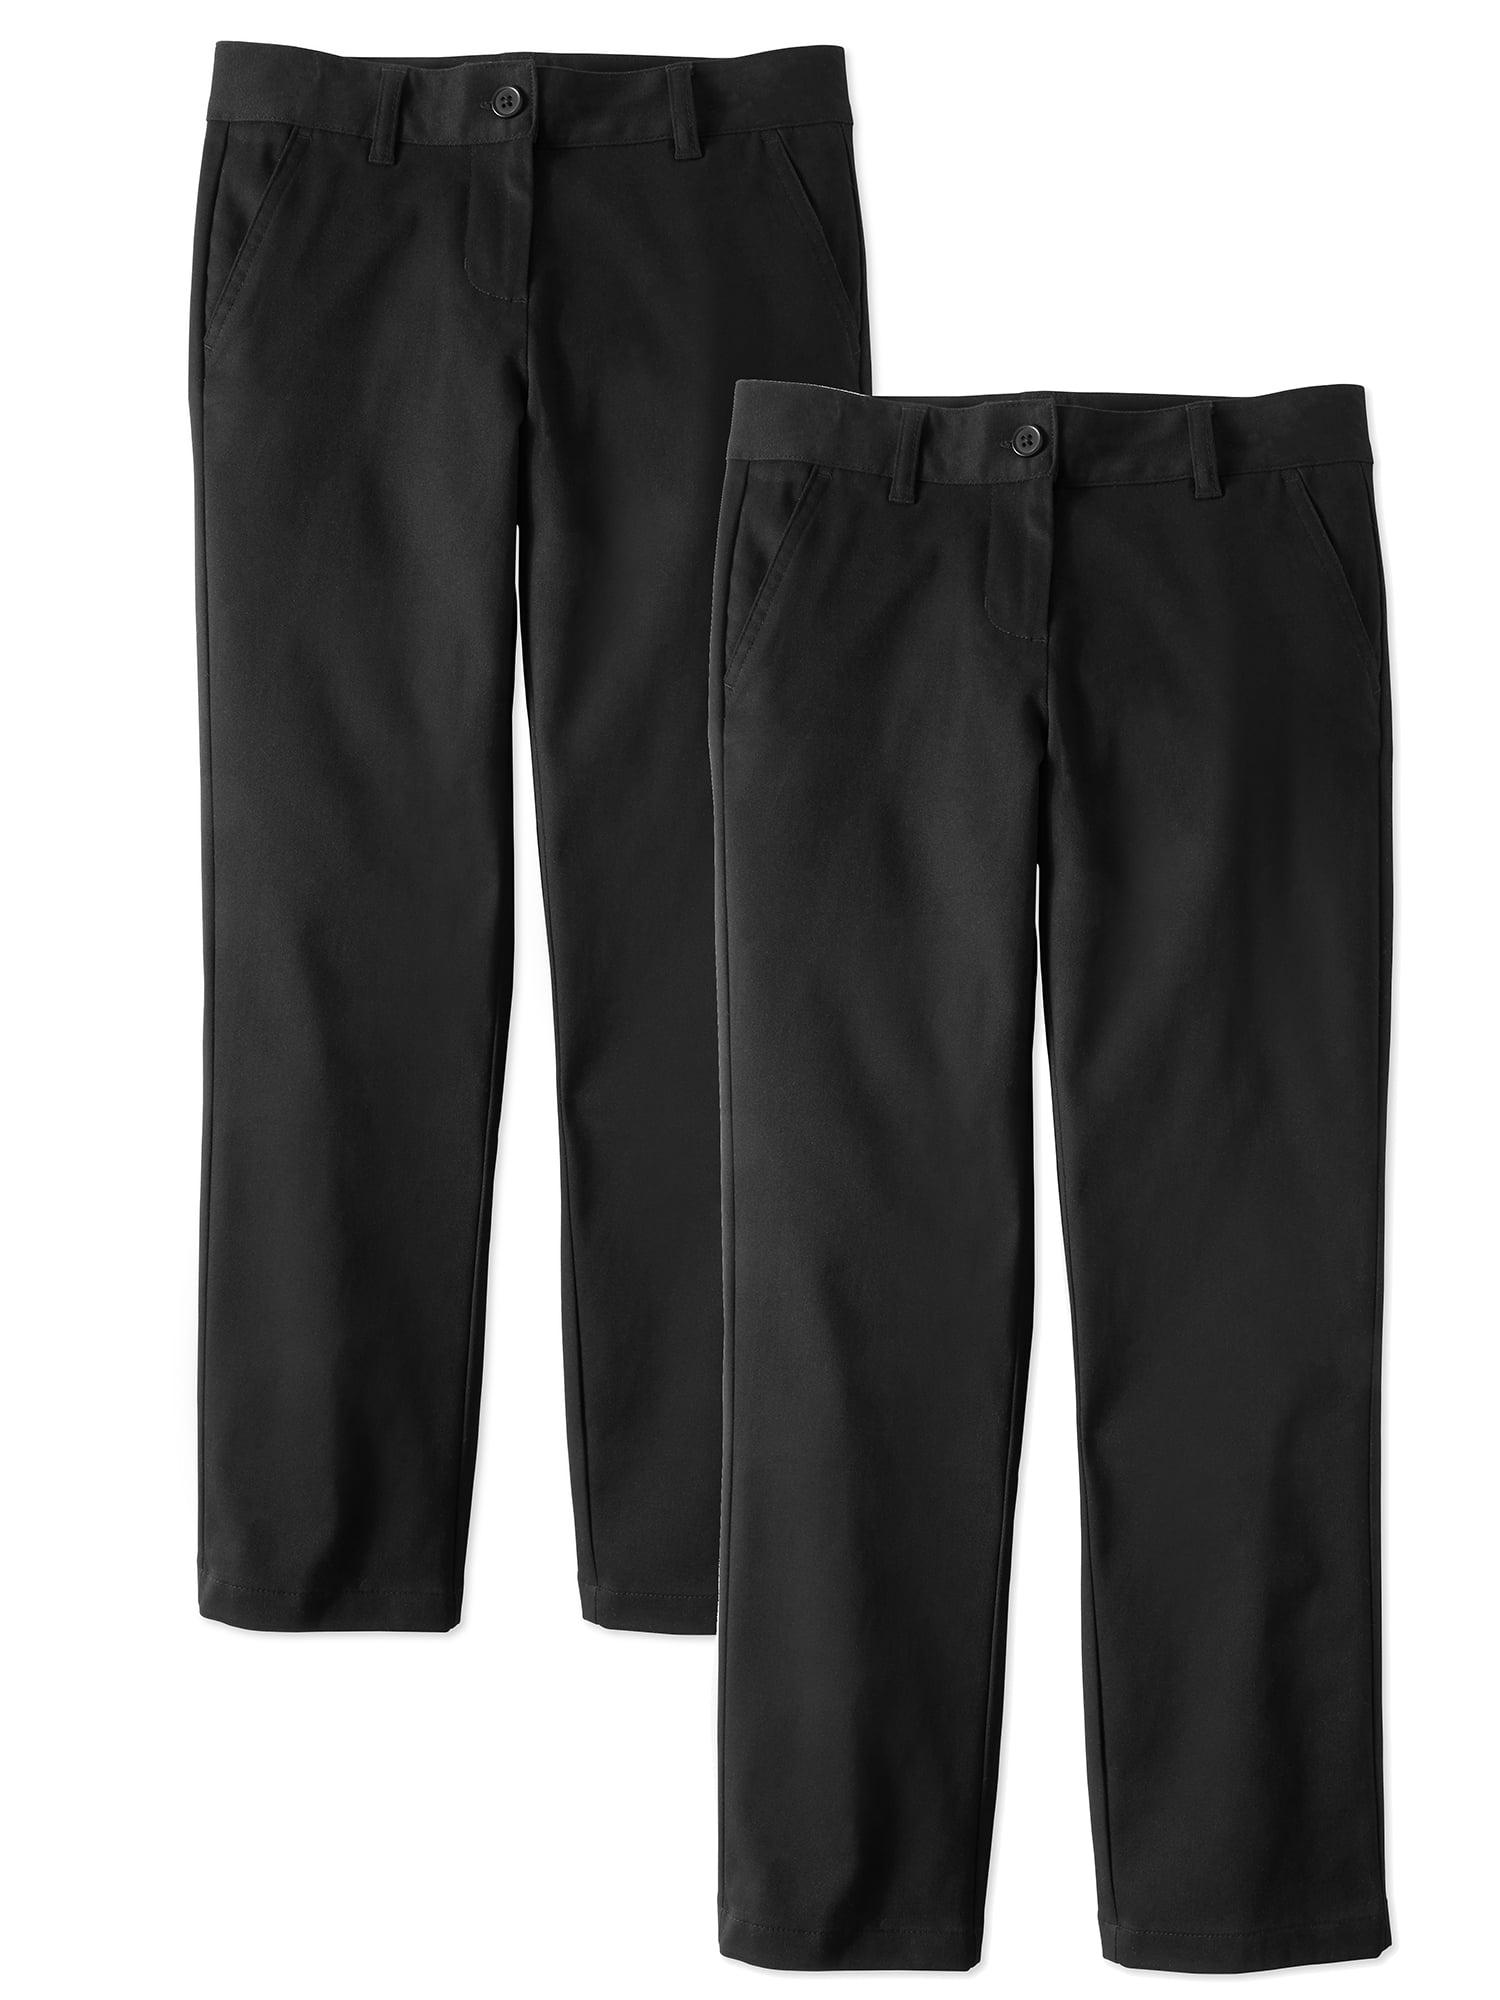 Wonder Nation Girls School Uniform Stretch Twill Straight Fit Pants, 2-Pack Value Bundle